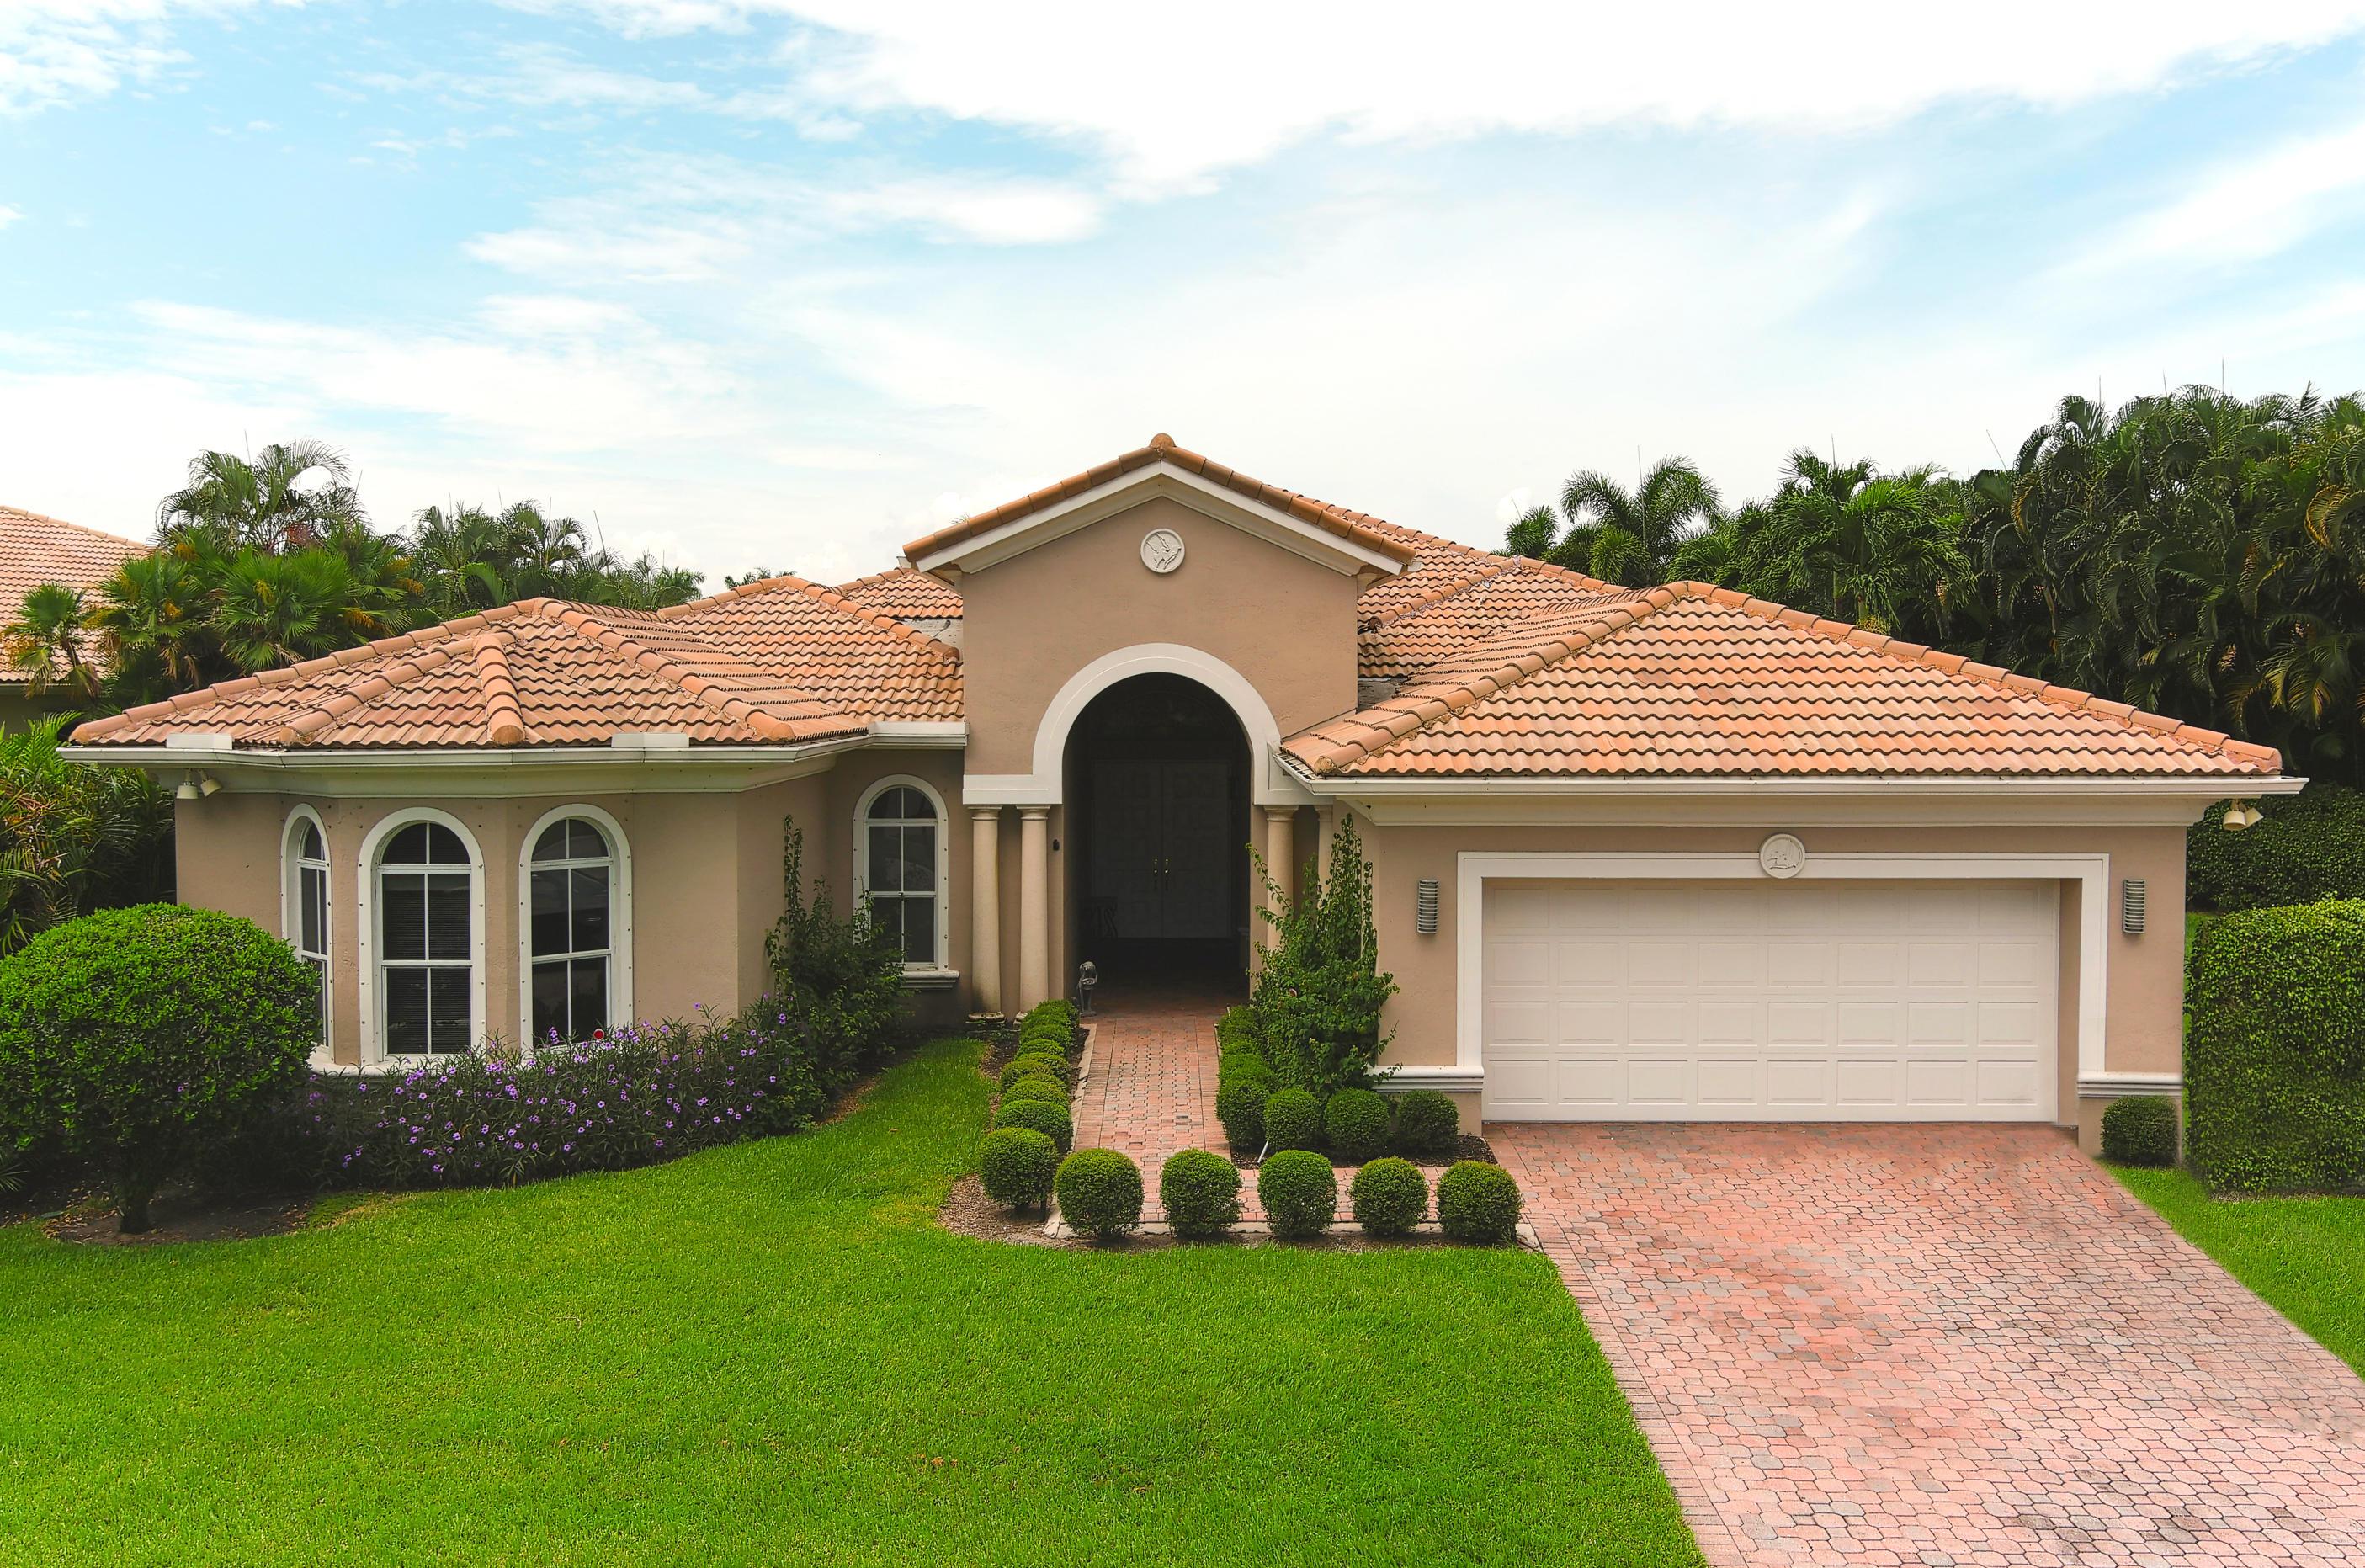 16505  Braeburn Ridge Trail  For Sale 10650029, FL